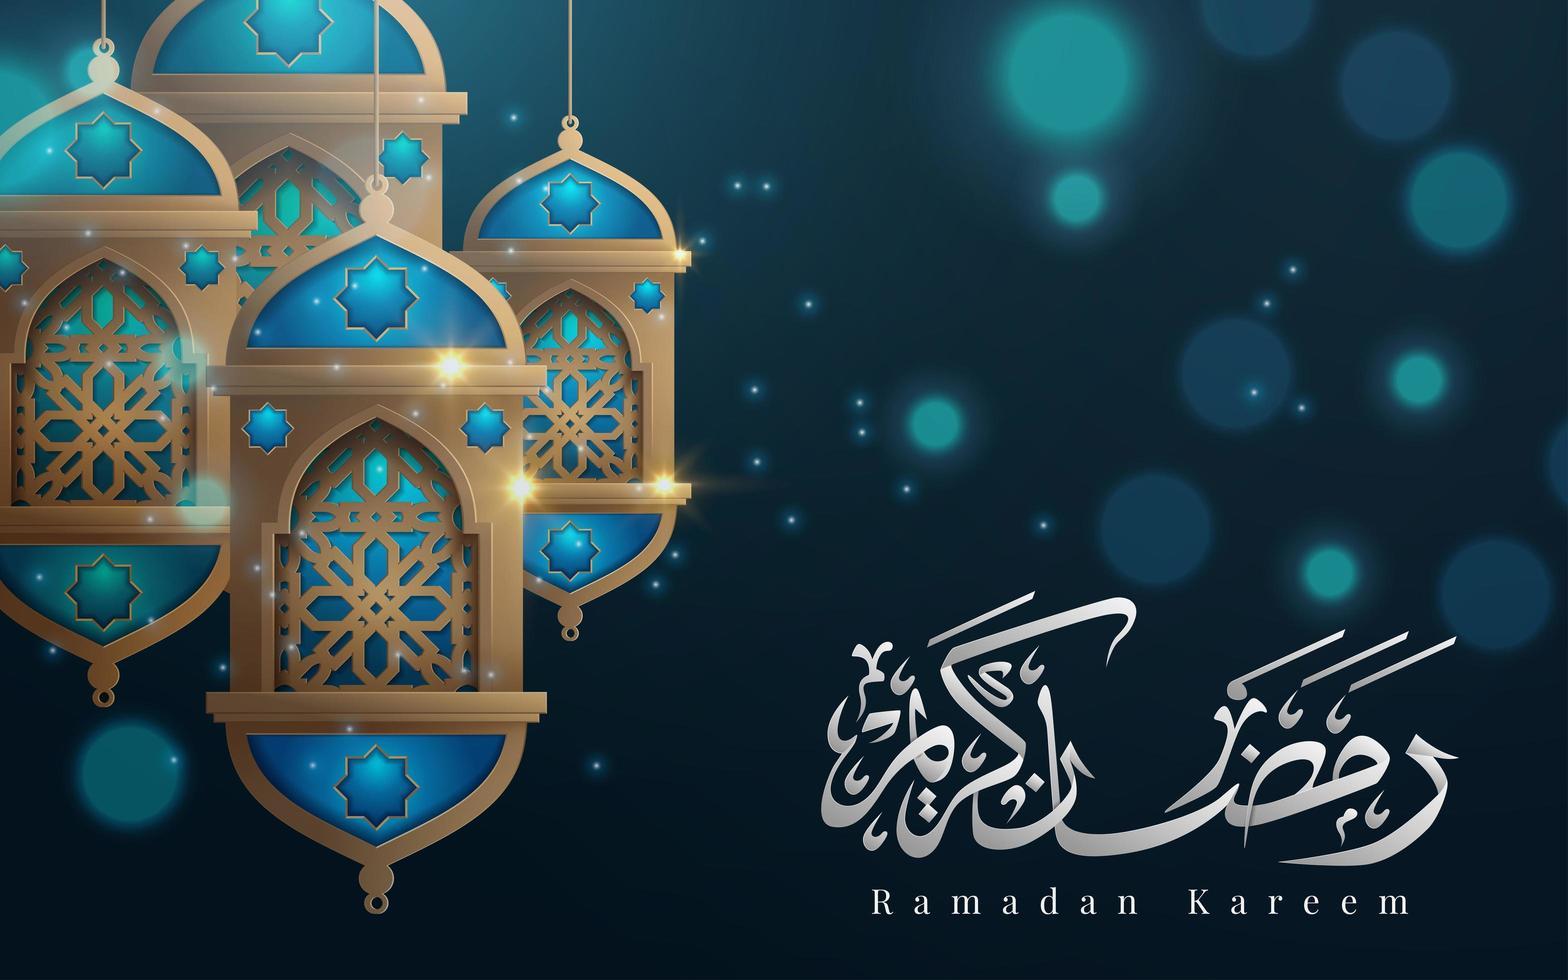 Ramadan Kareem saluto con lanterne e calligrafia vettore